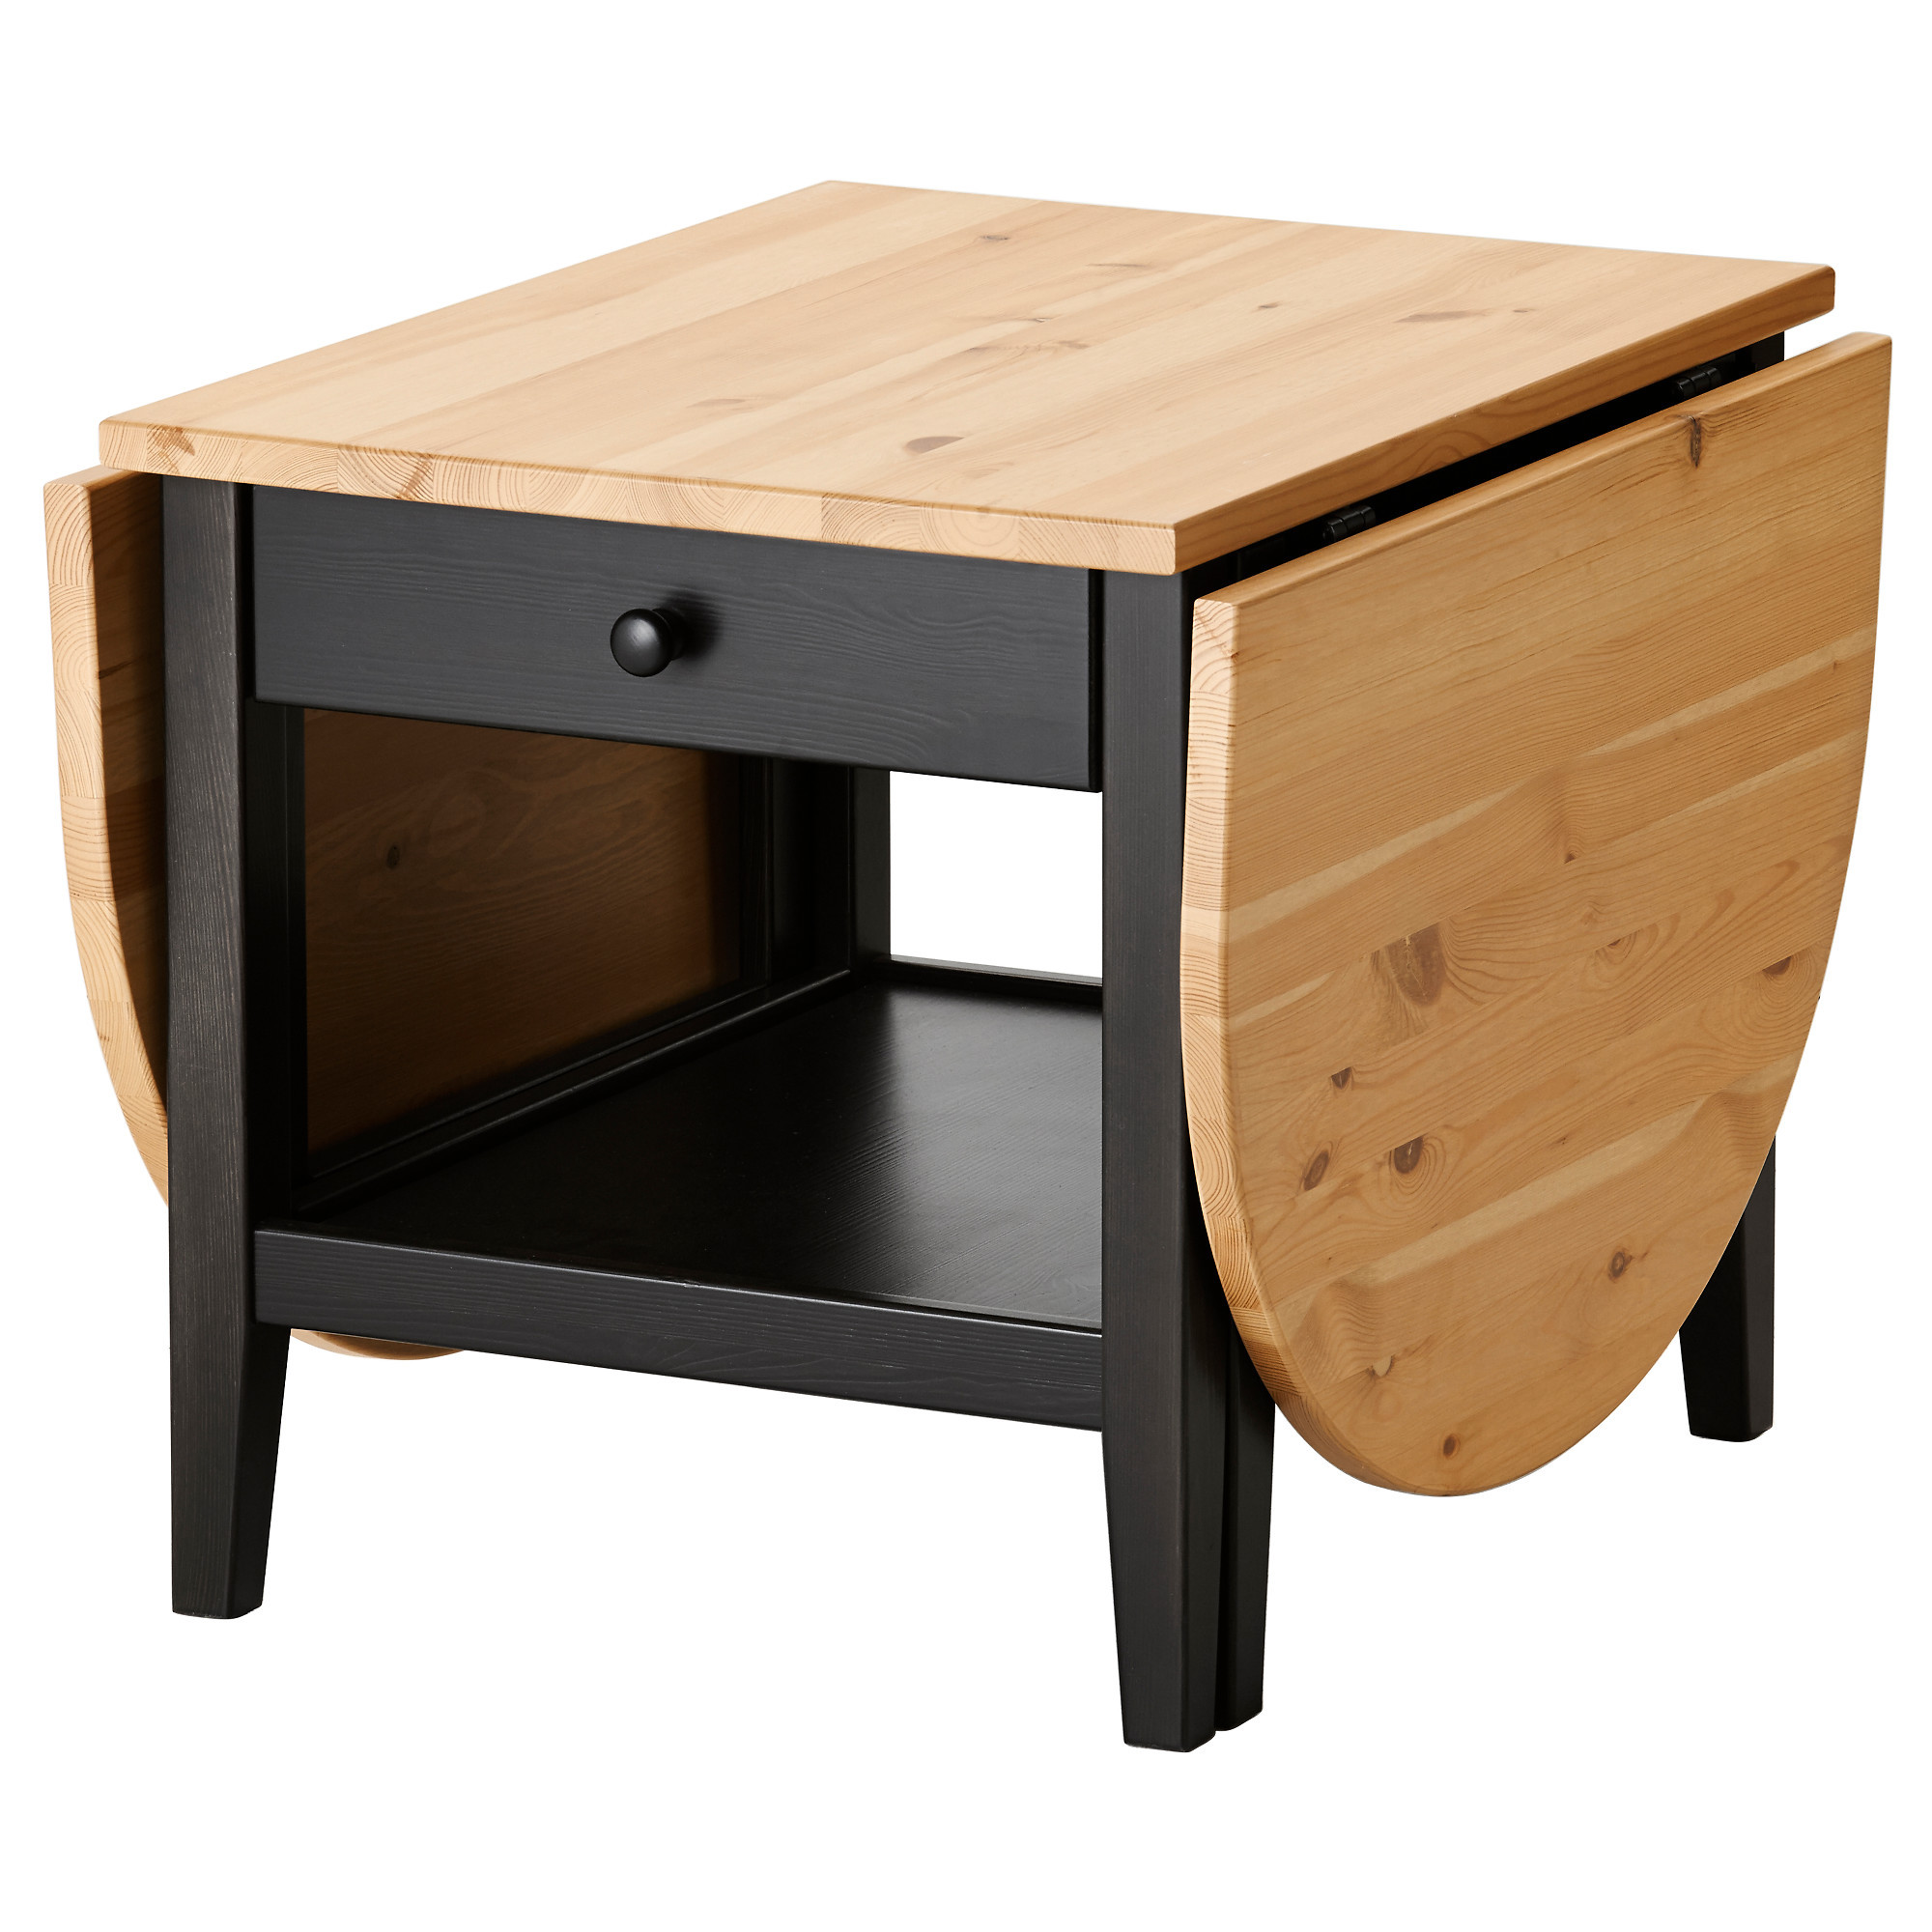 Small Folding Coffee Table